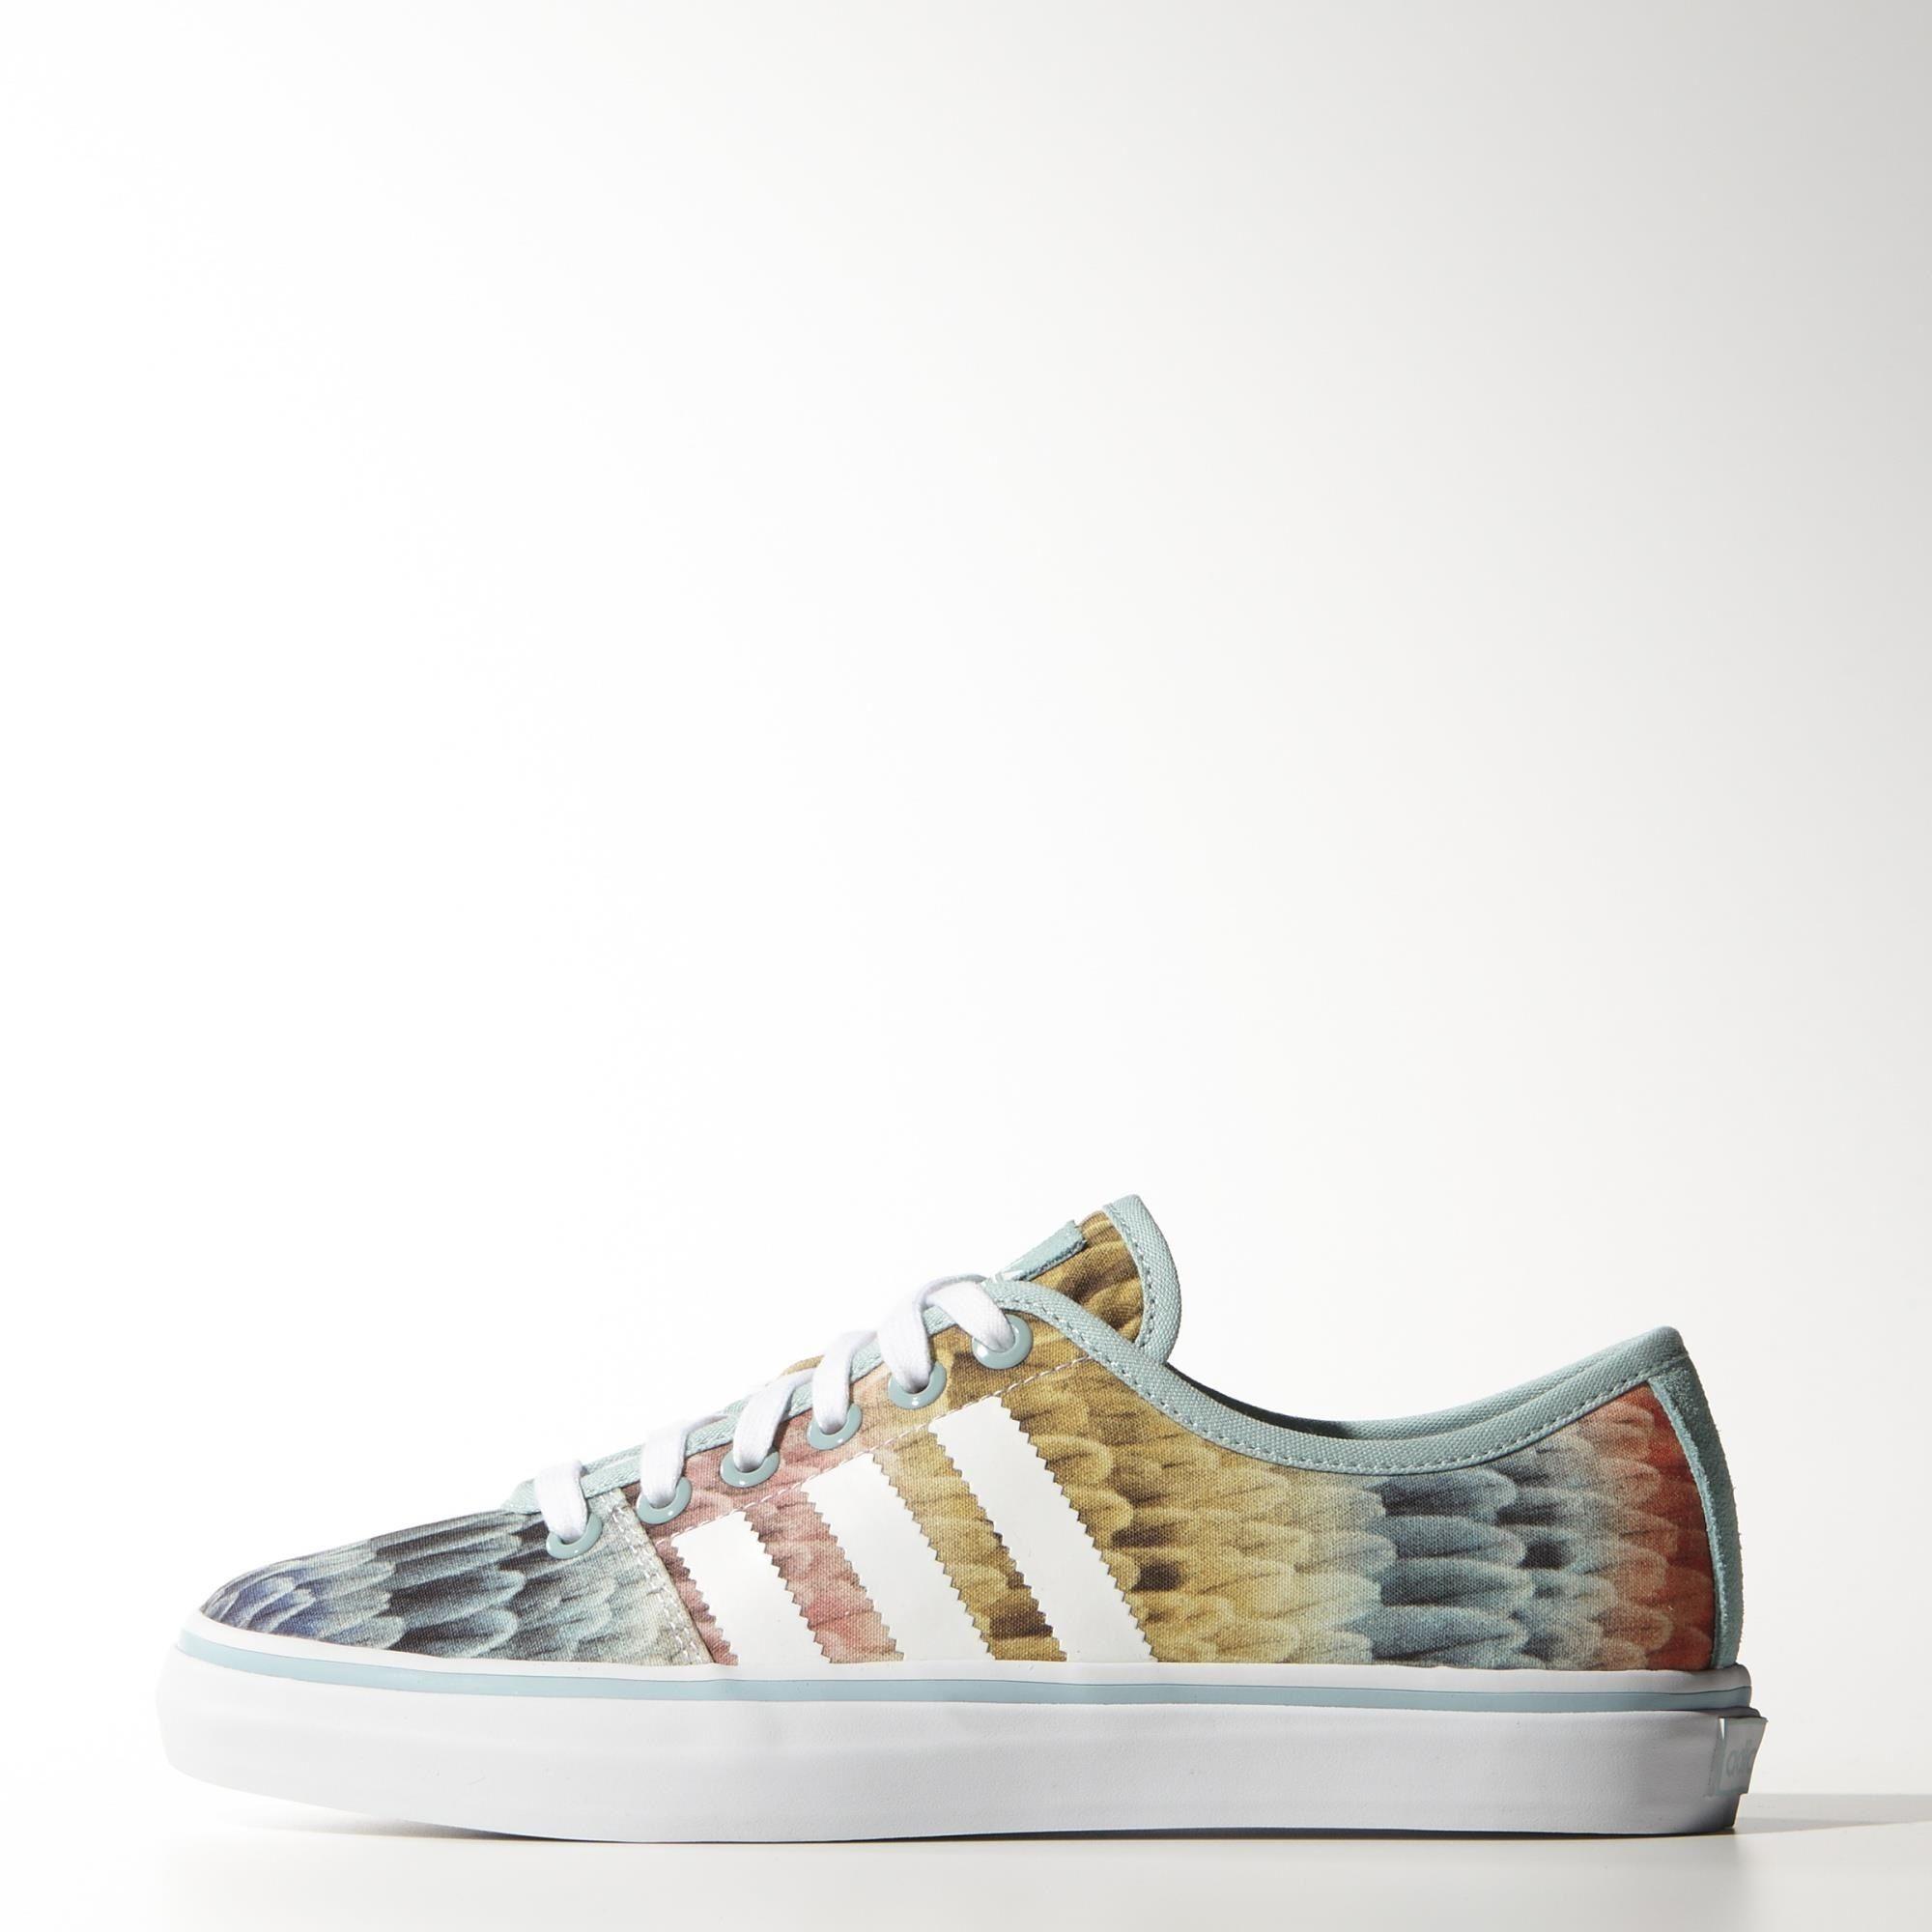 Zapatos azules de verano Adidas Adria para mujer FN5fpThe